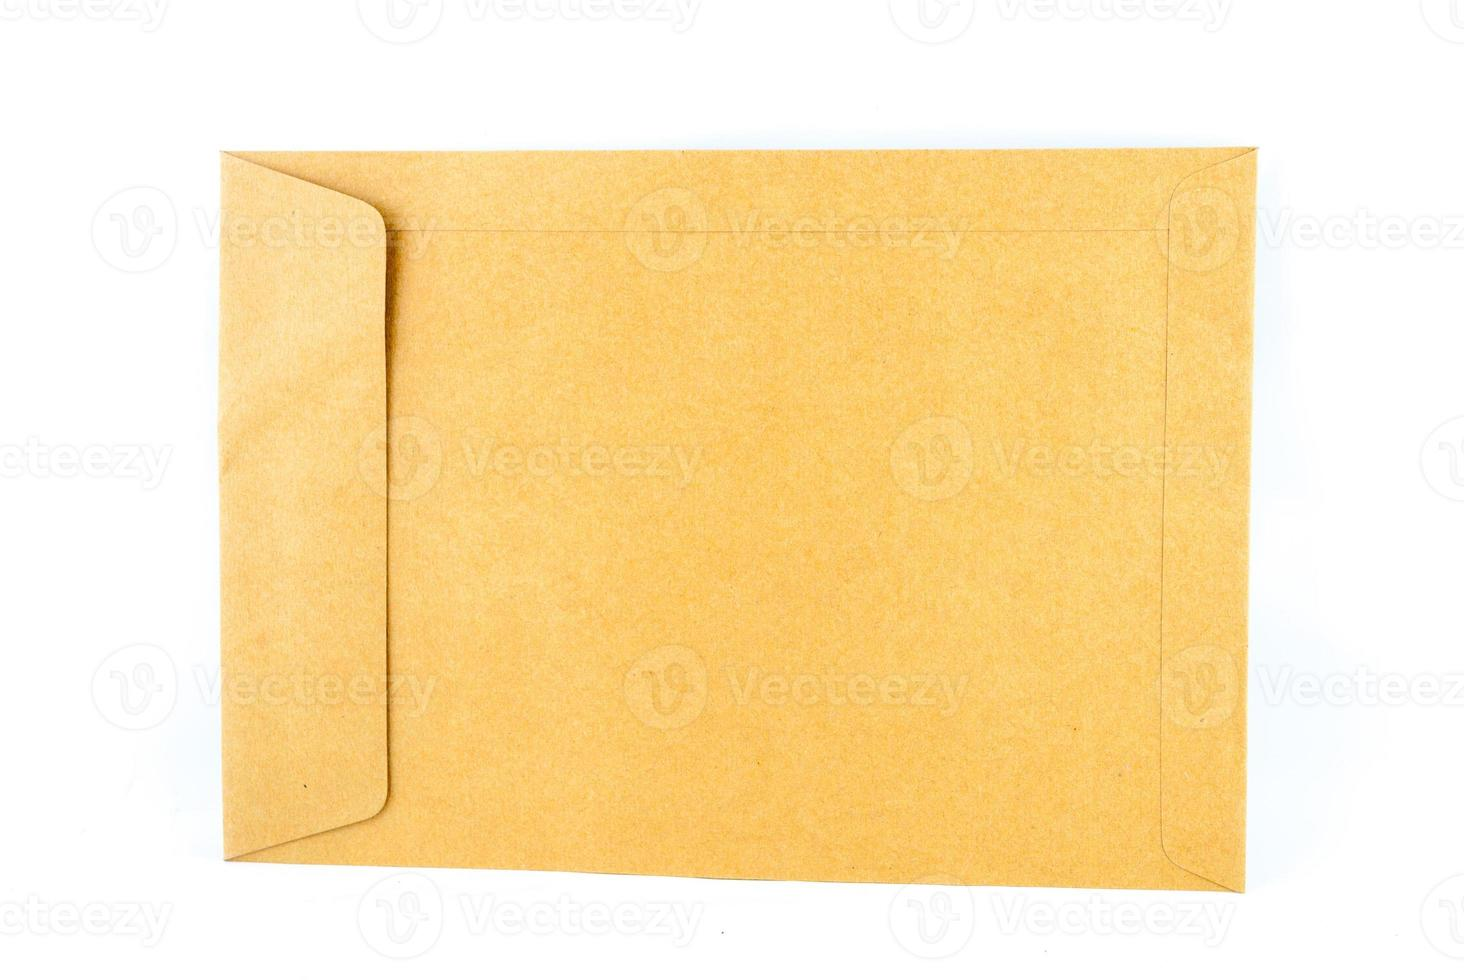 documento busta marrone foto